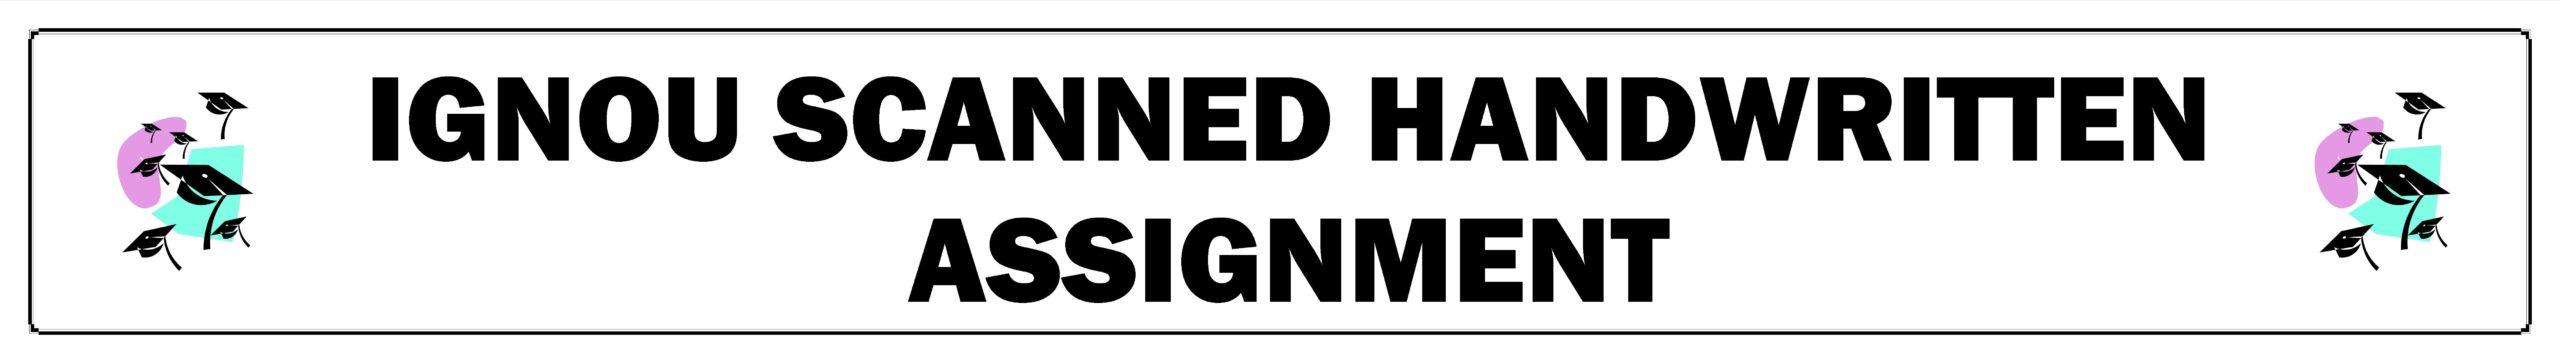 IGNOU SCANNED HANDWRITTEN ASSIGNMENT